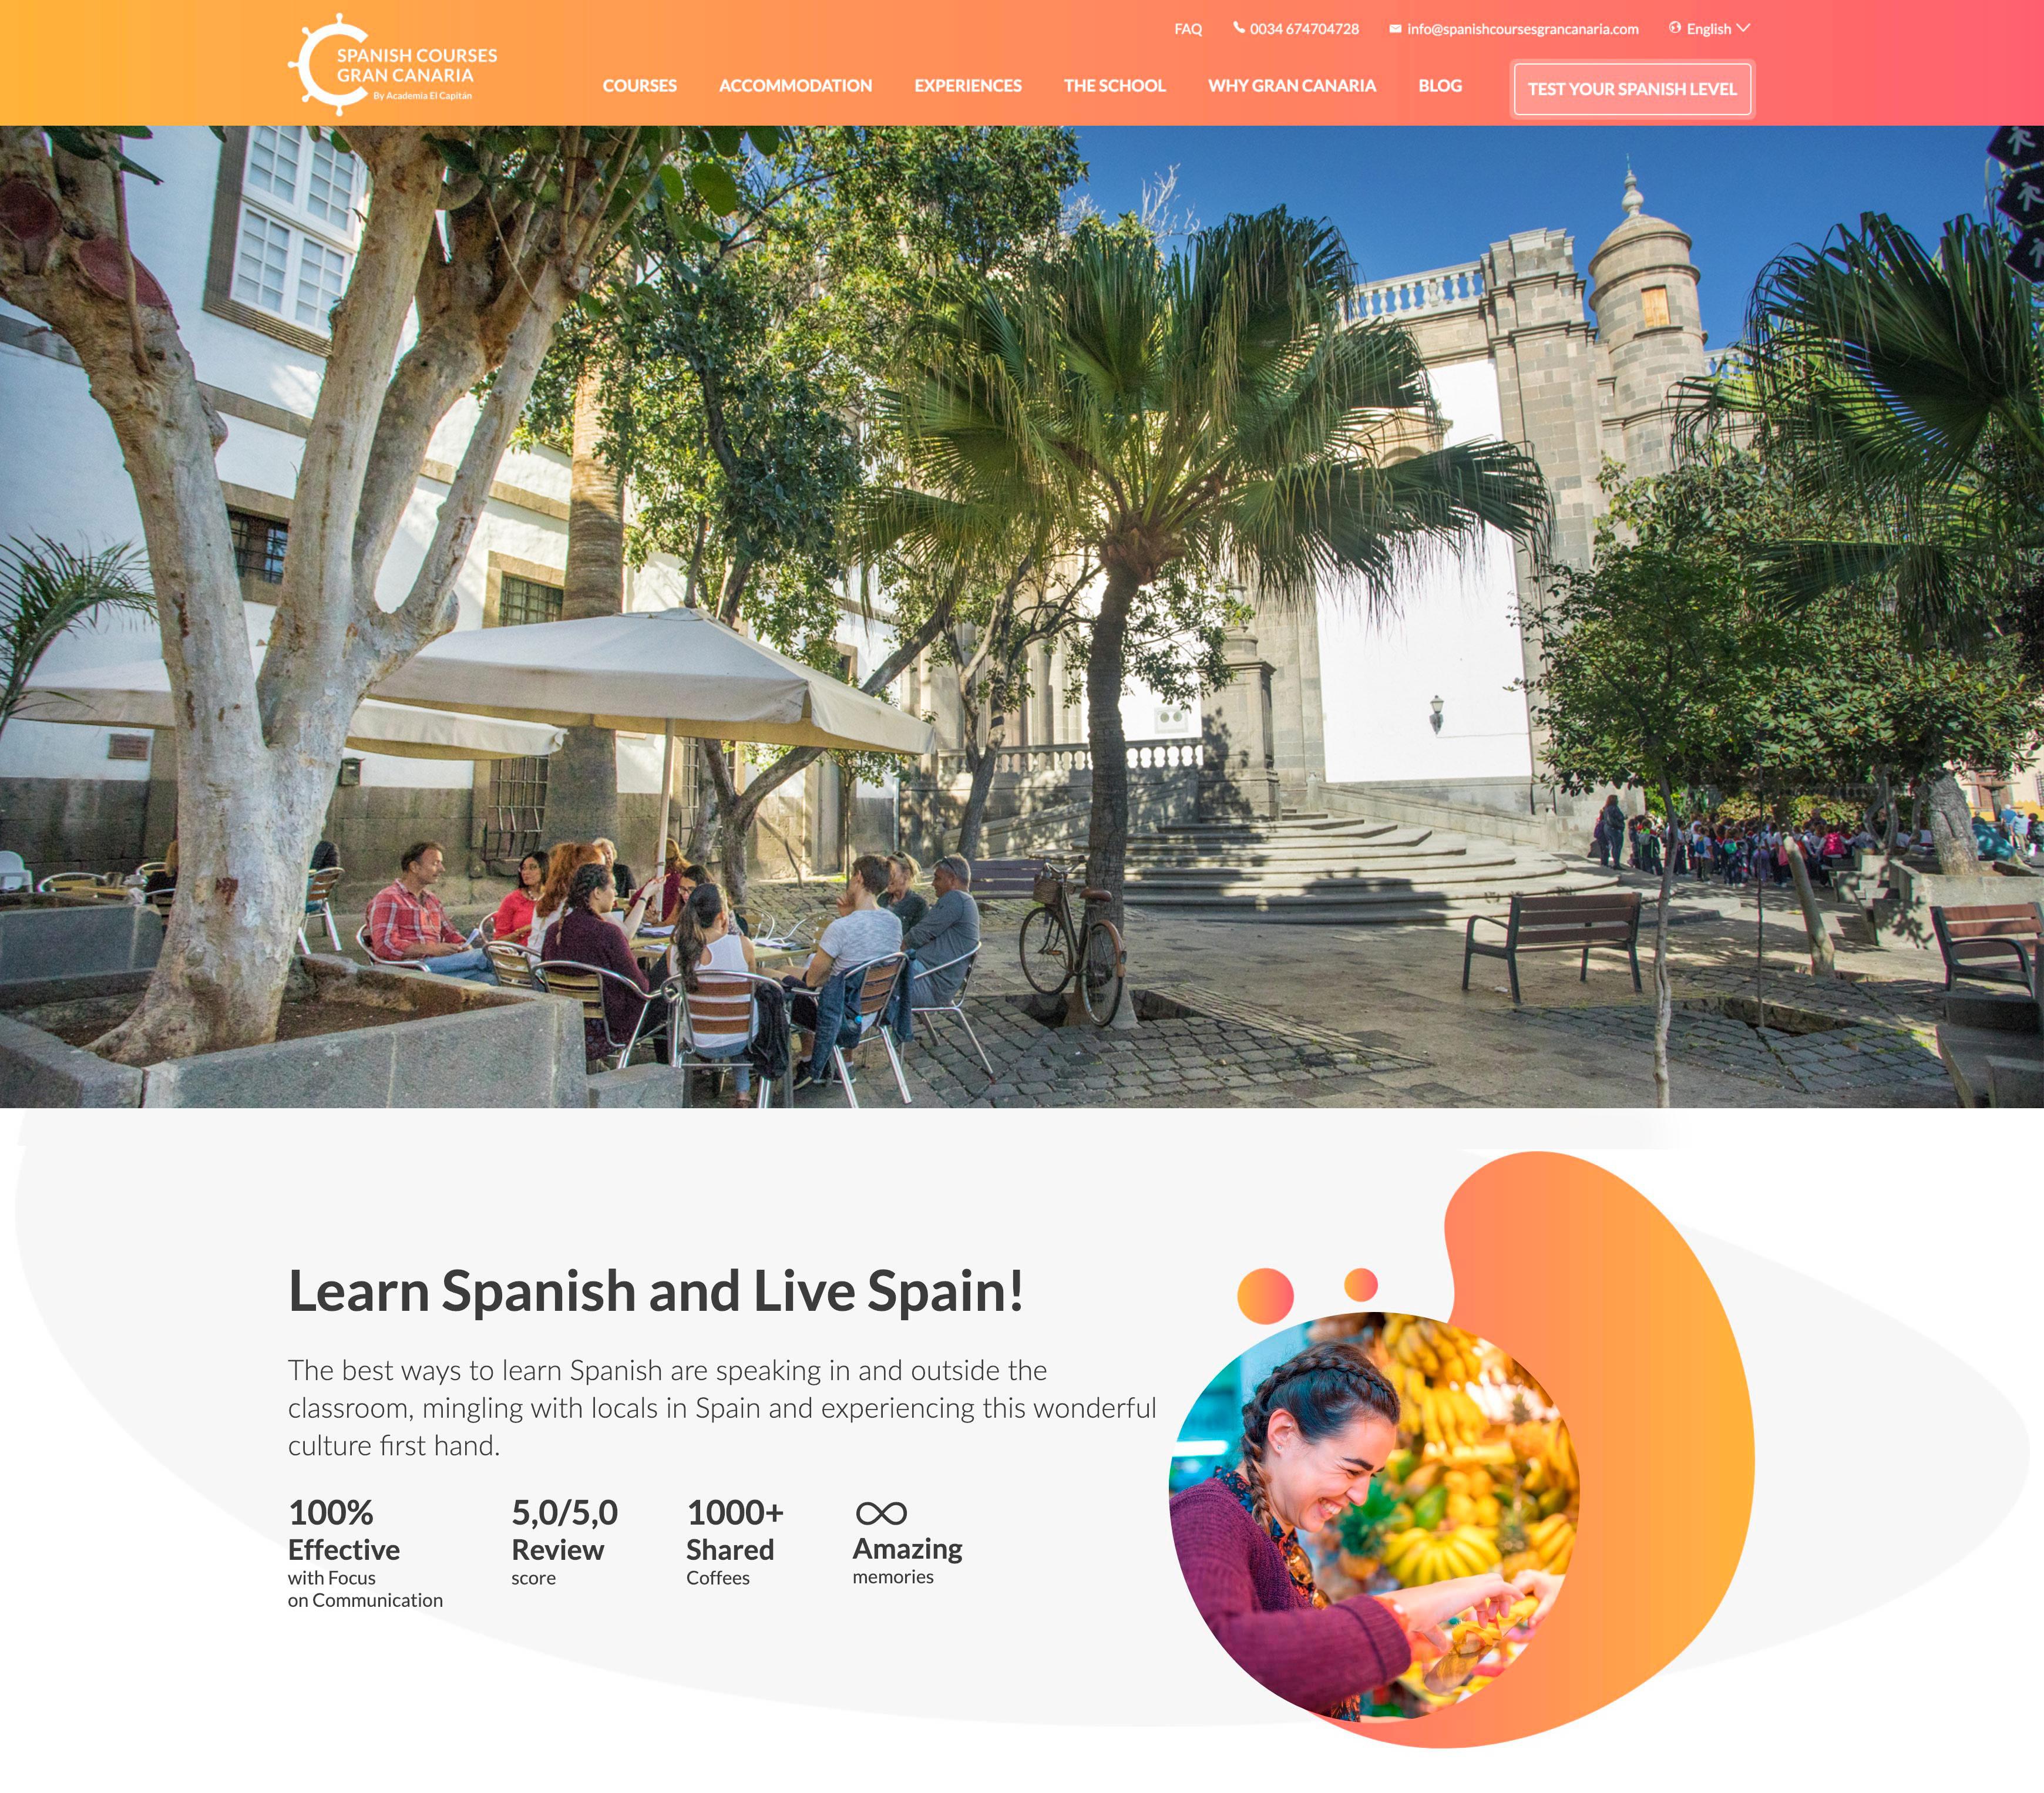 Spanish Courses Gran Canaria, portada de la web